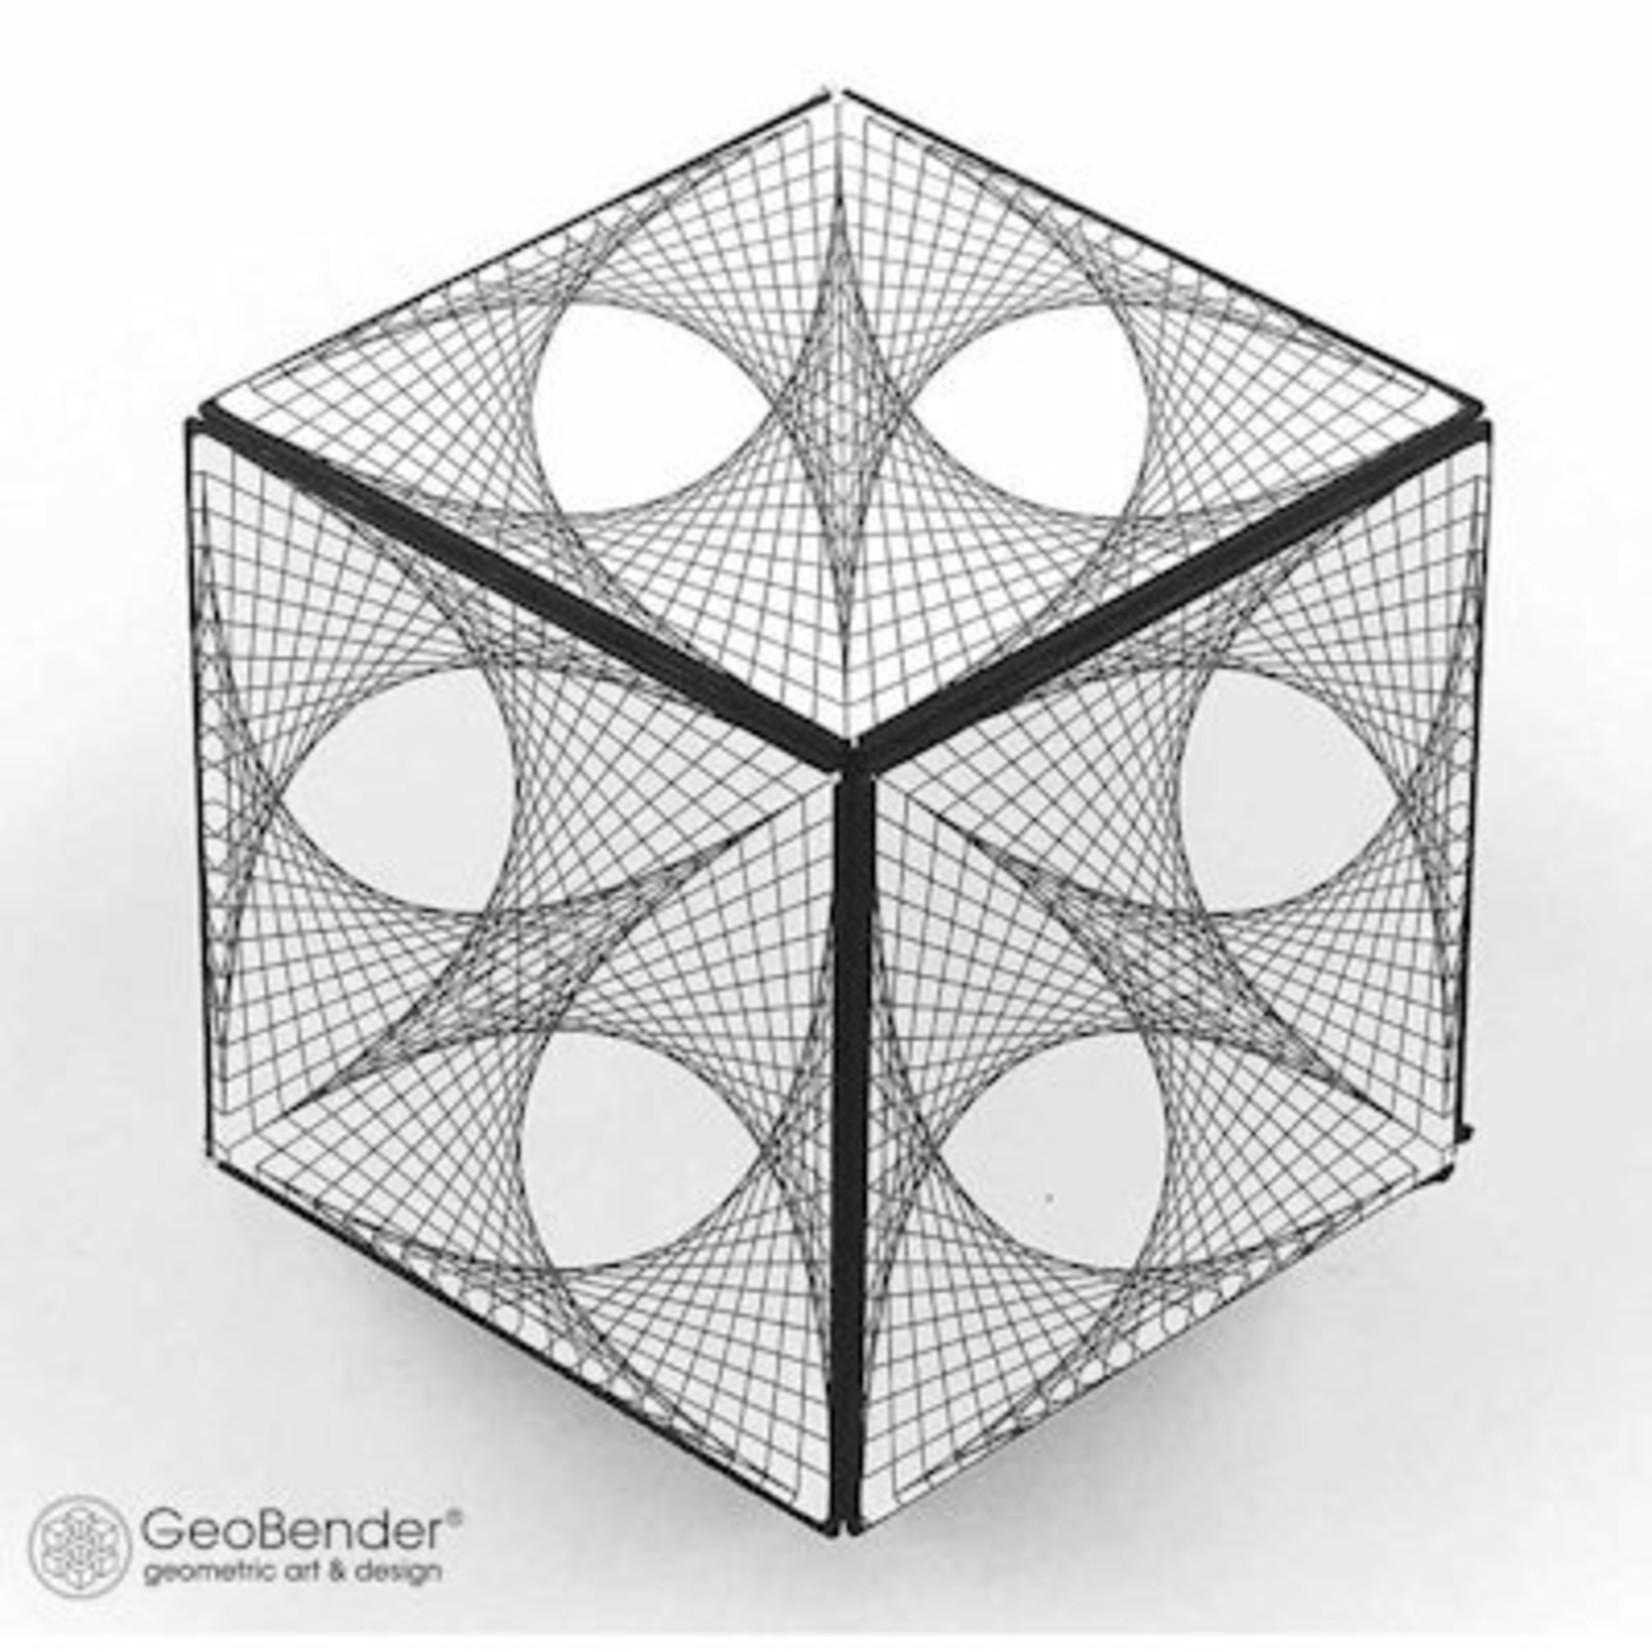 Geobender Geobender kubus